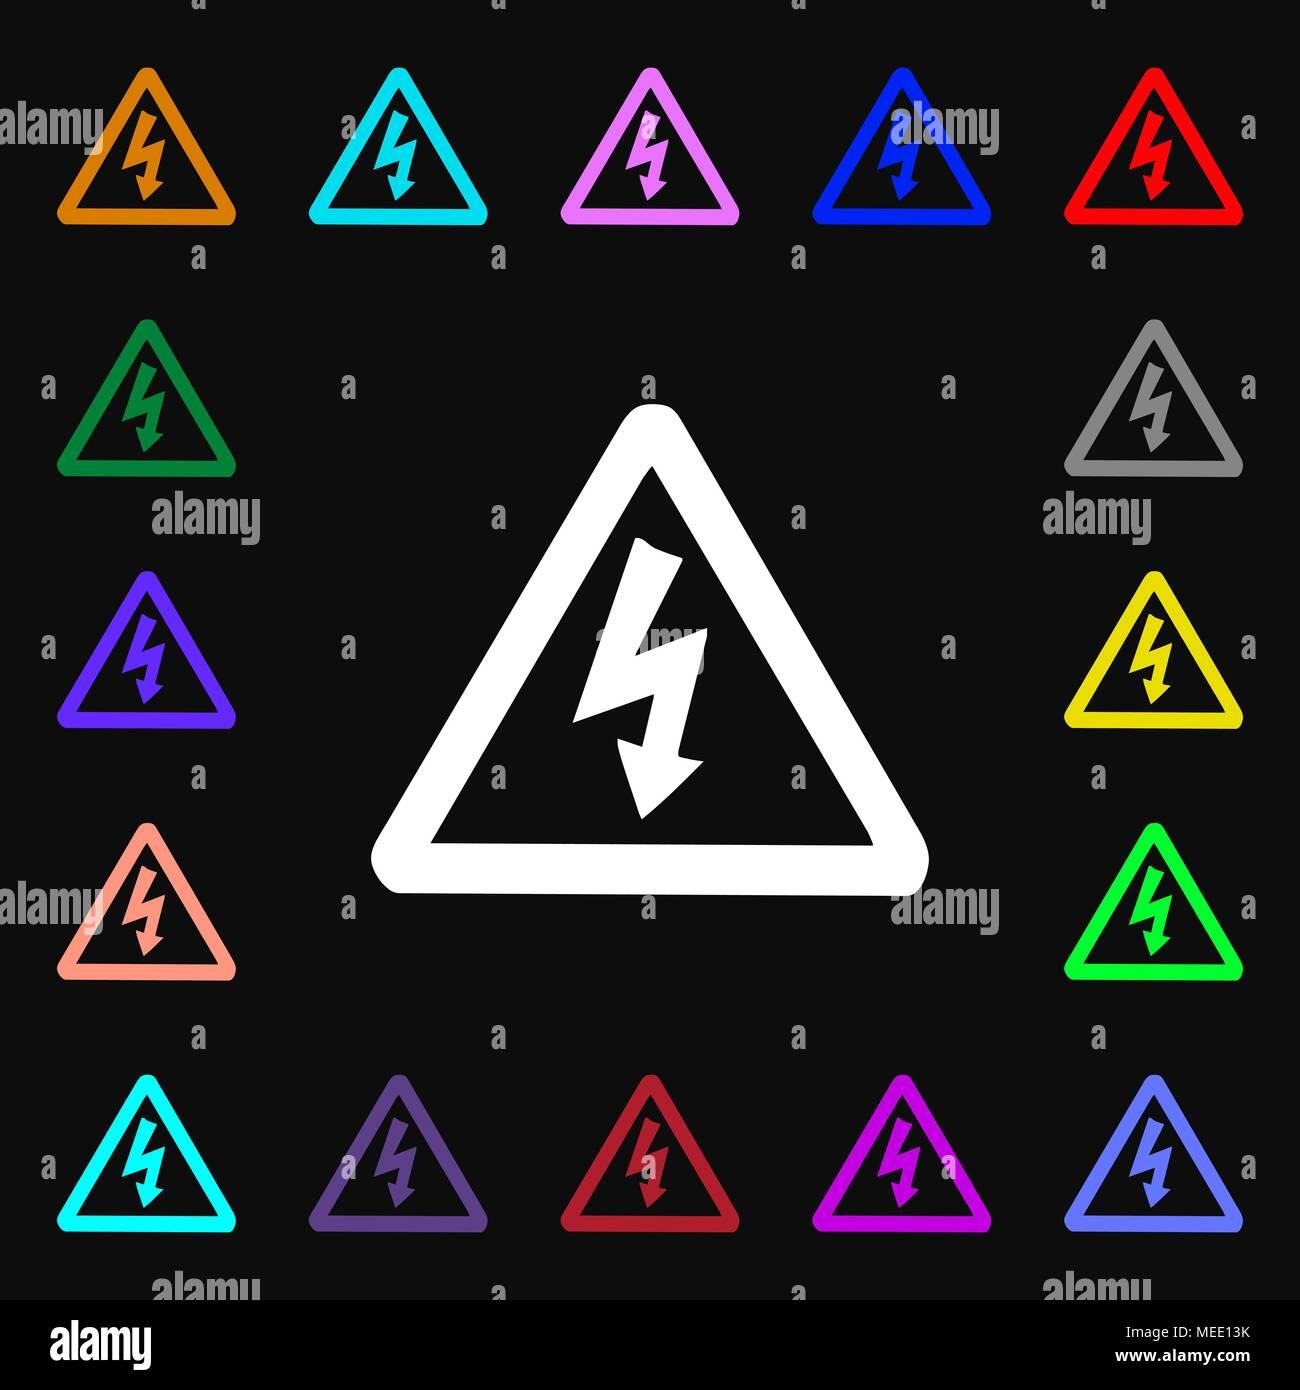 Caution Sign Acid Stockfotos & Caution Sign Acid Bilder - Alamy